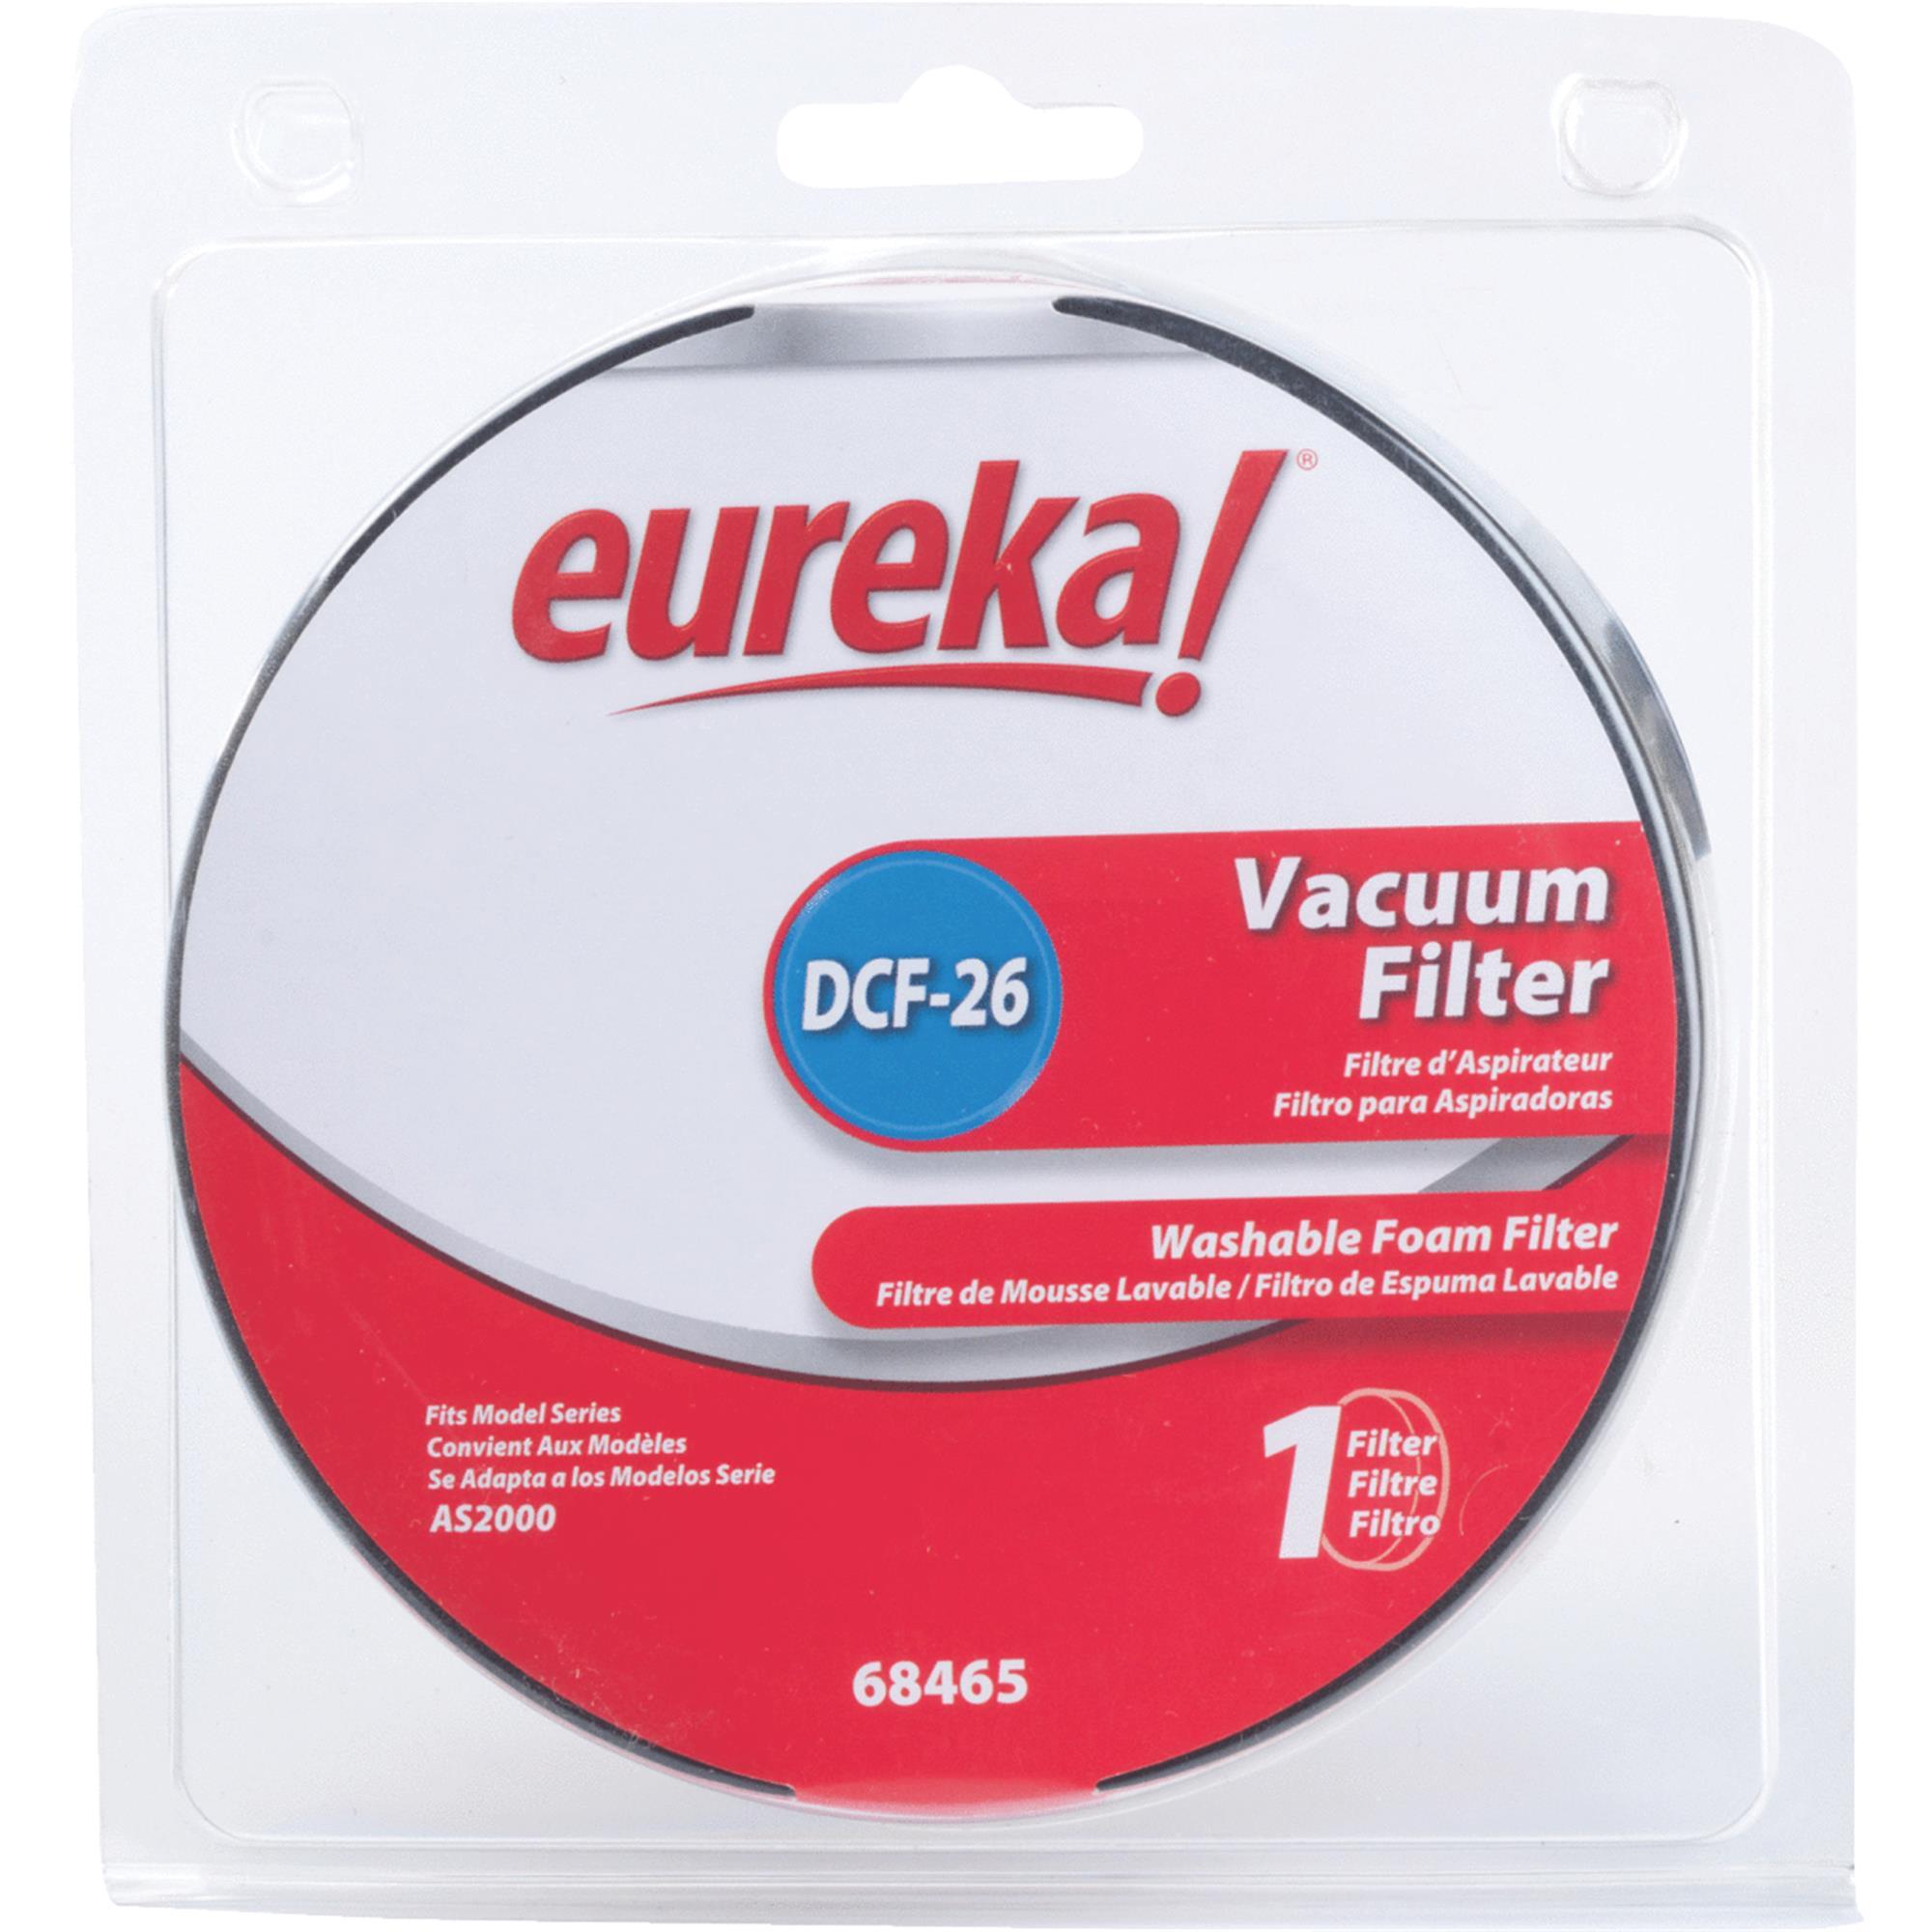 Eureka Dcf -26